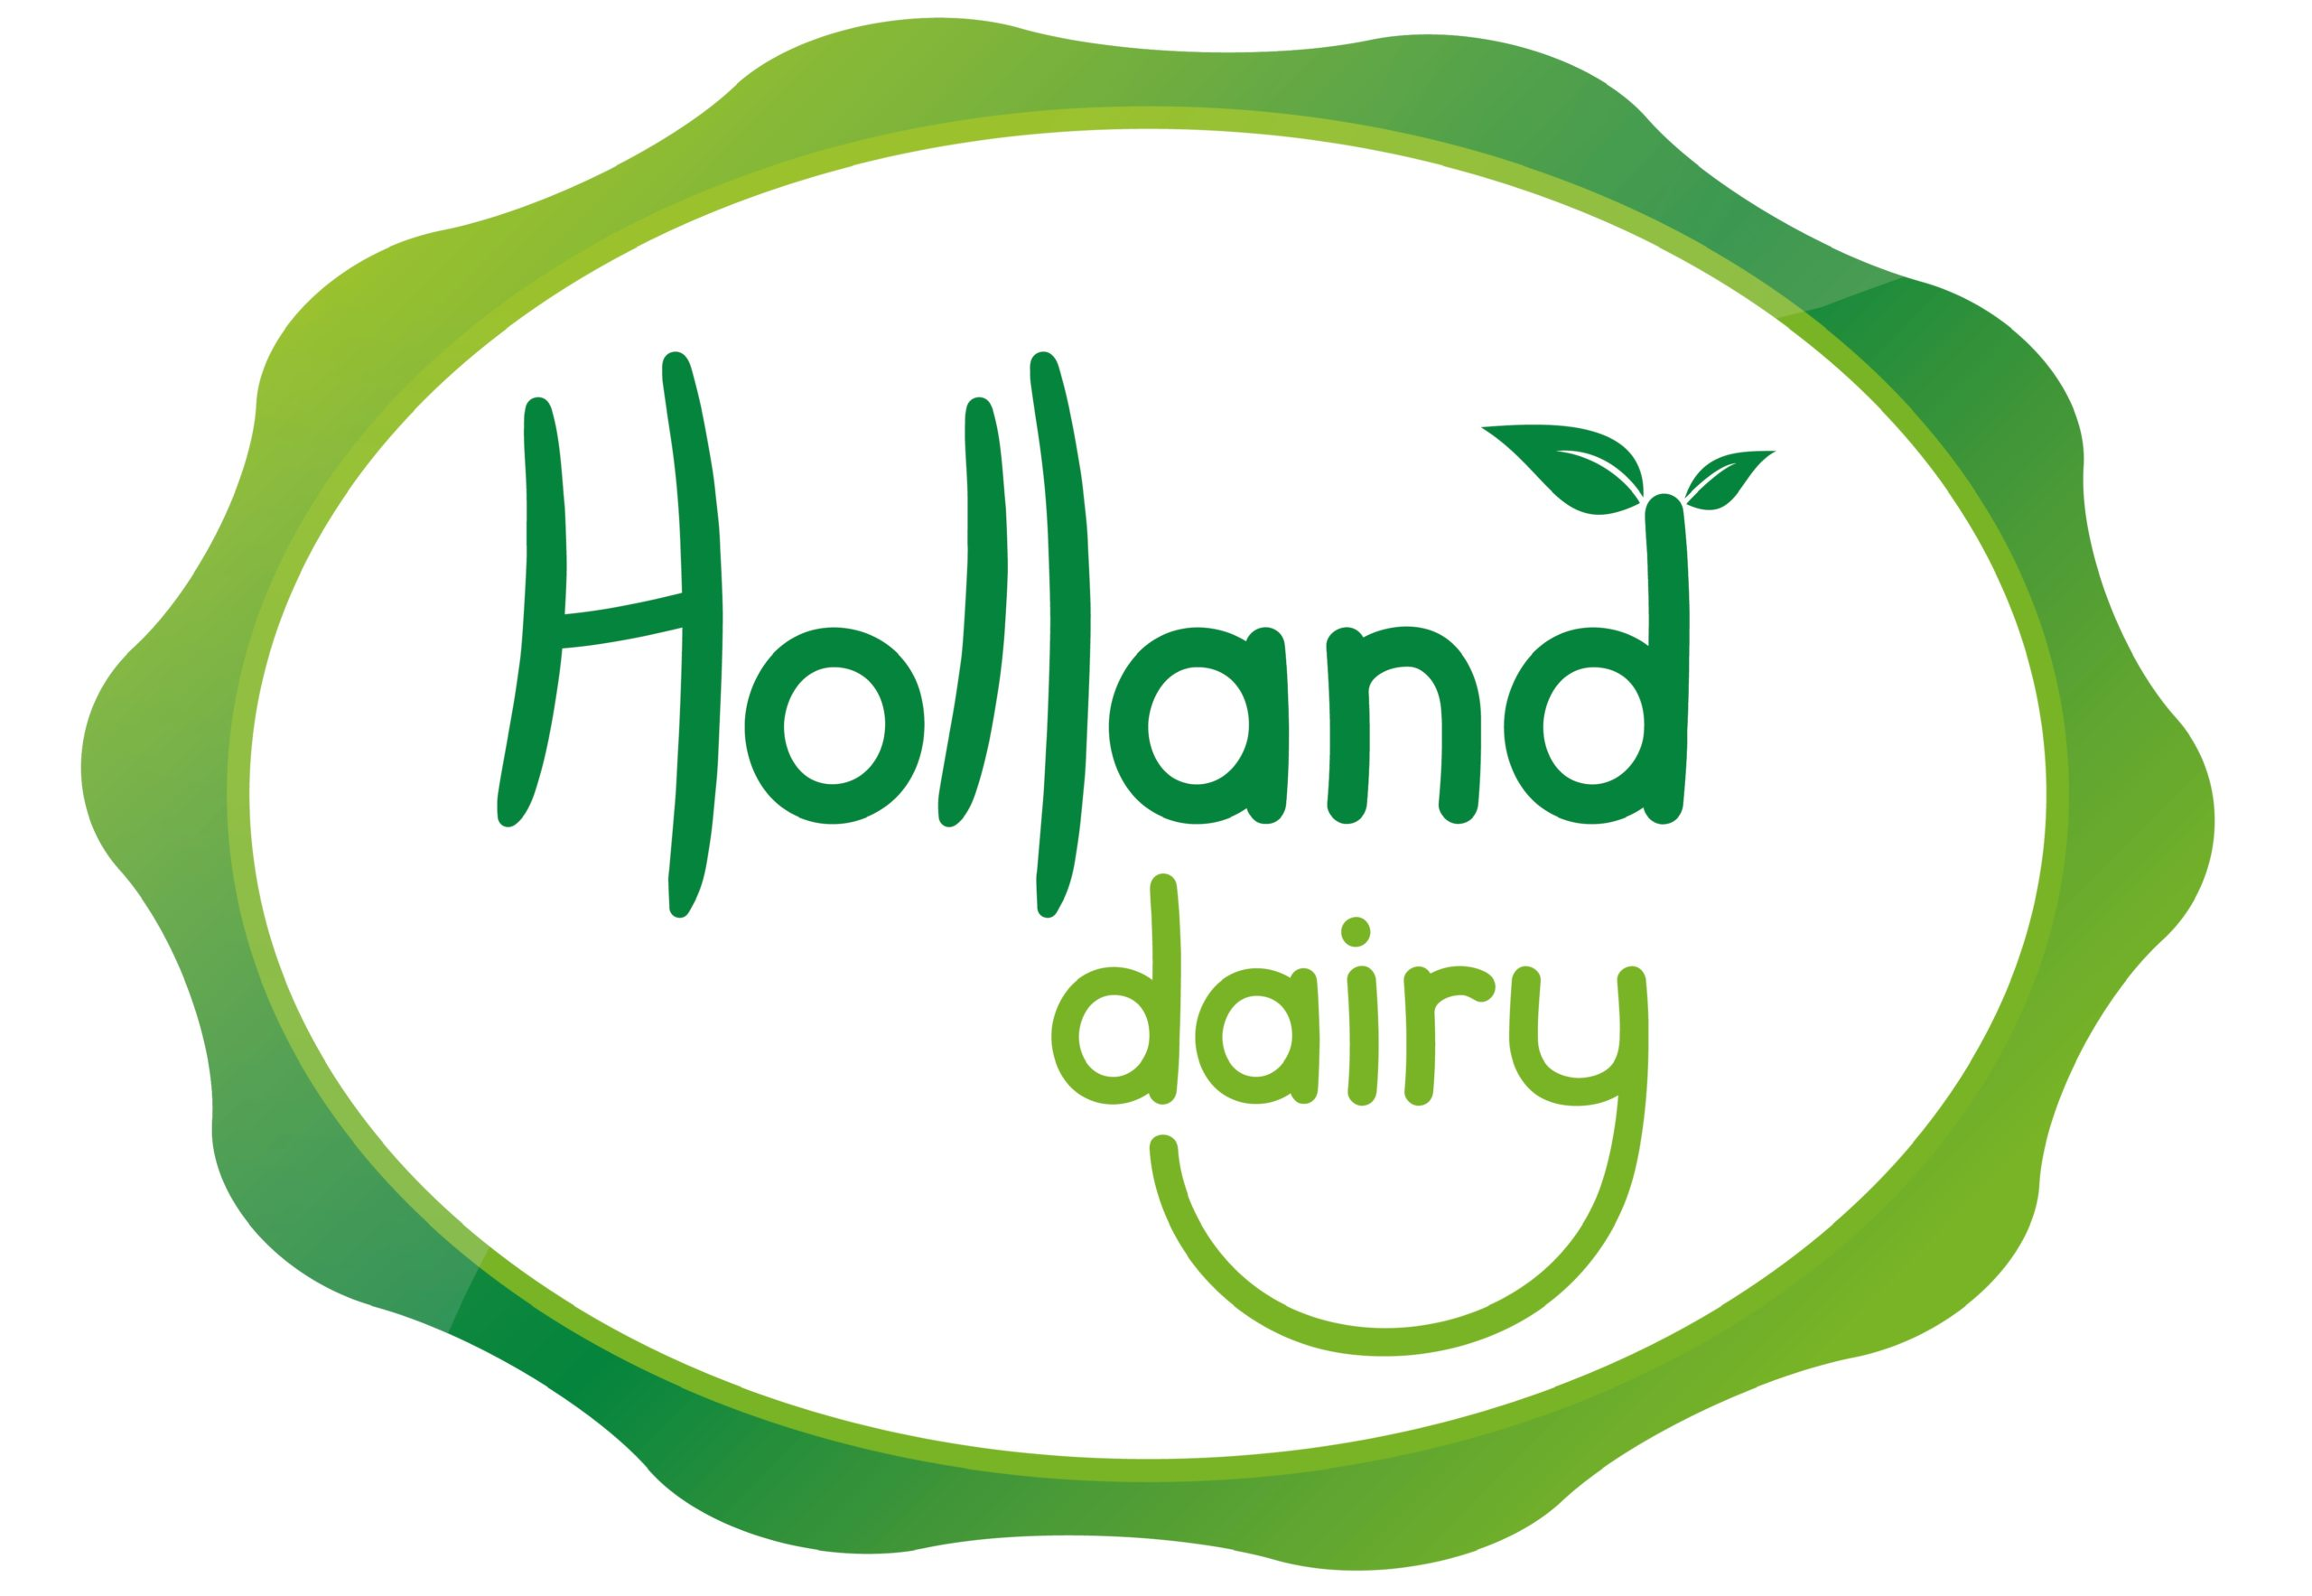 Holland dairy logo